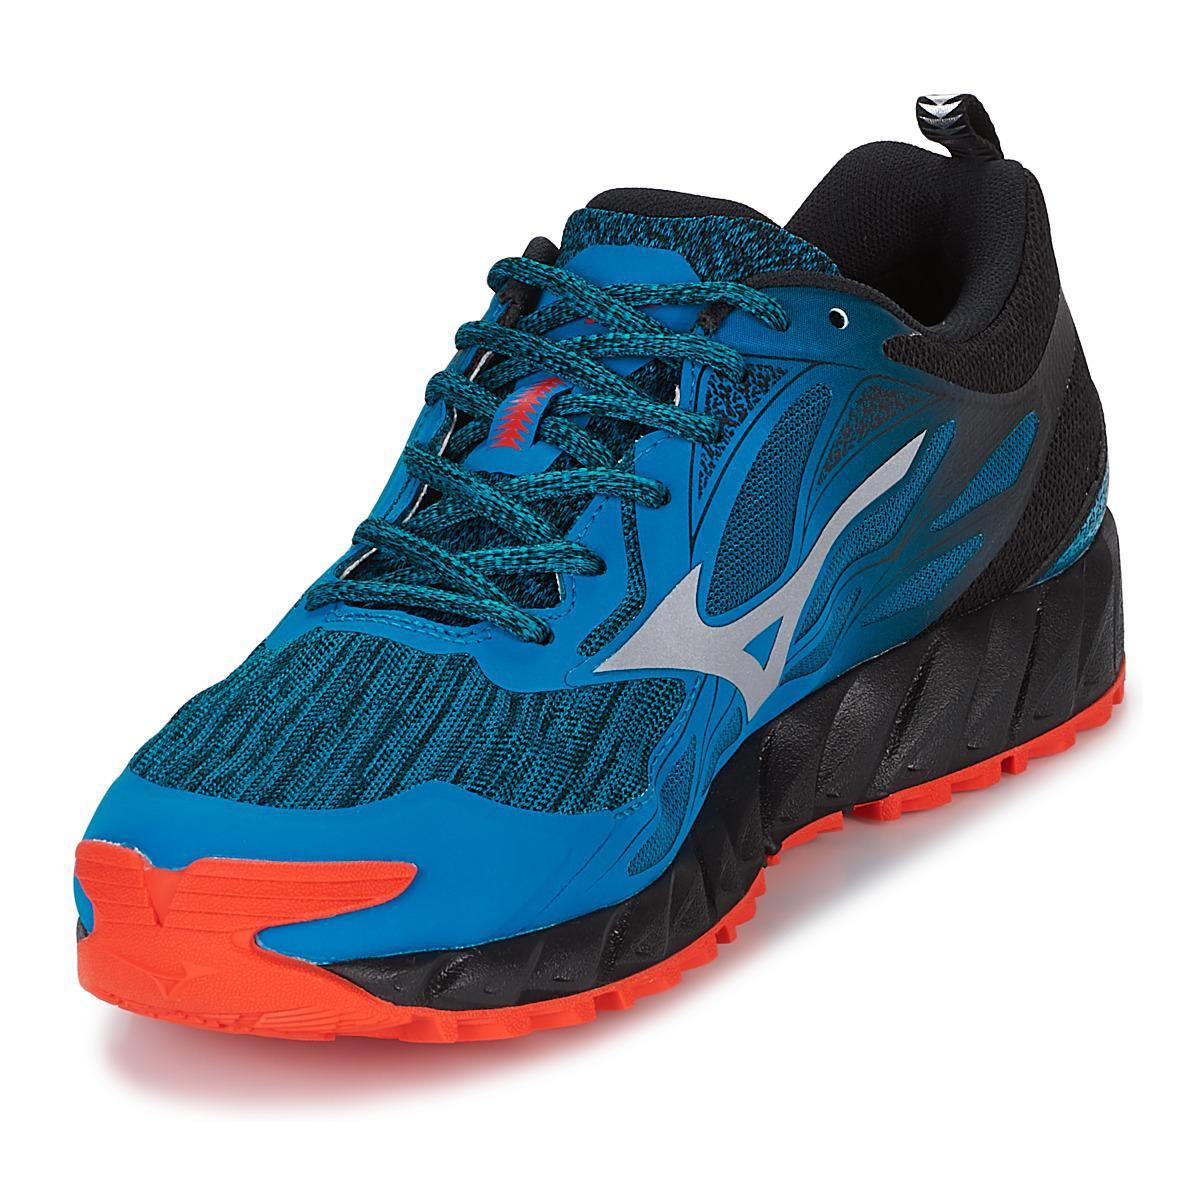 Mizuno Wave Ibuki Gtx Running Trainers in Blue for Men